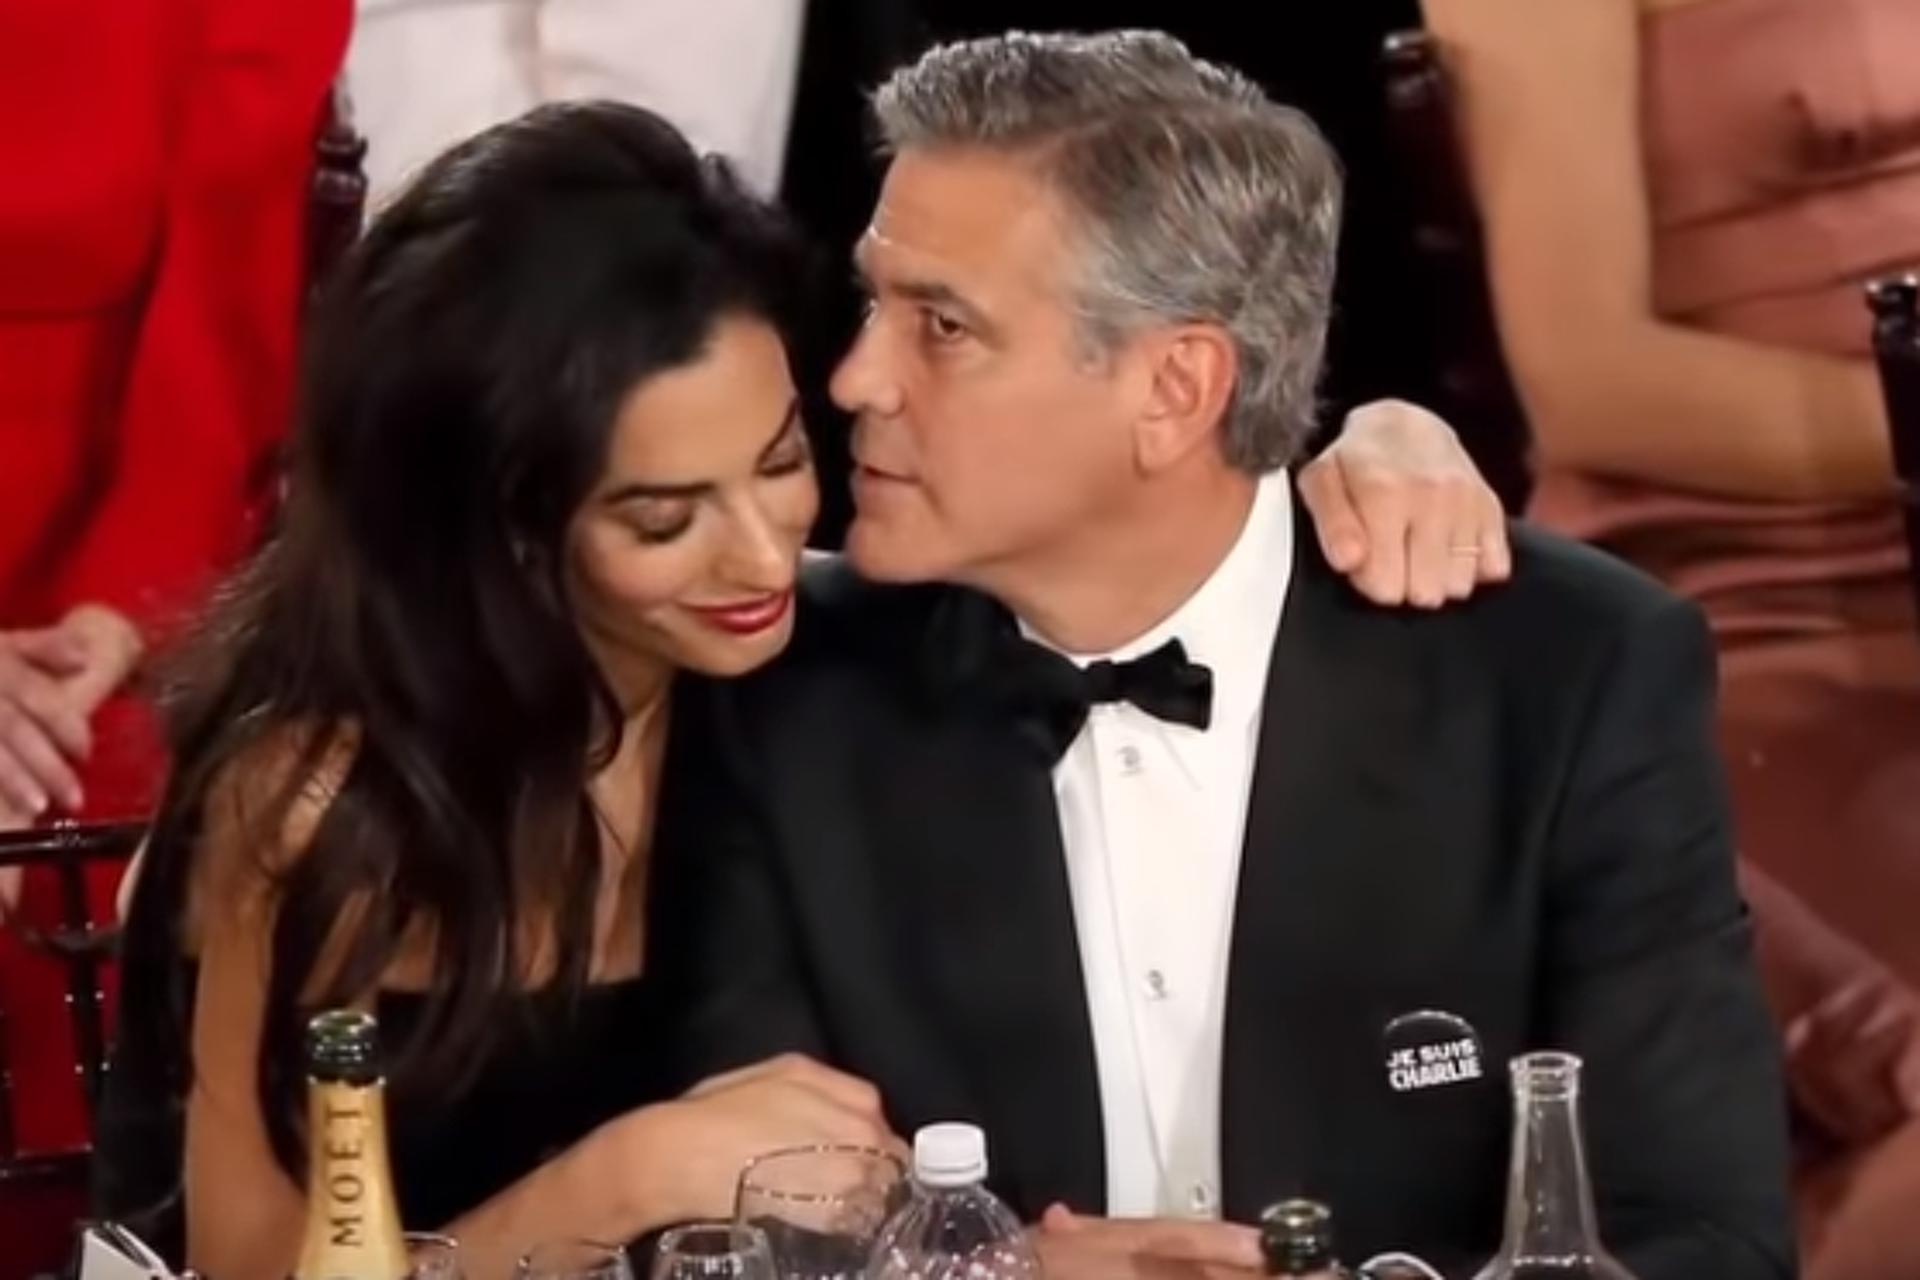 George Clooney feleségével, Amal Alamuddinnal